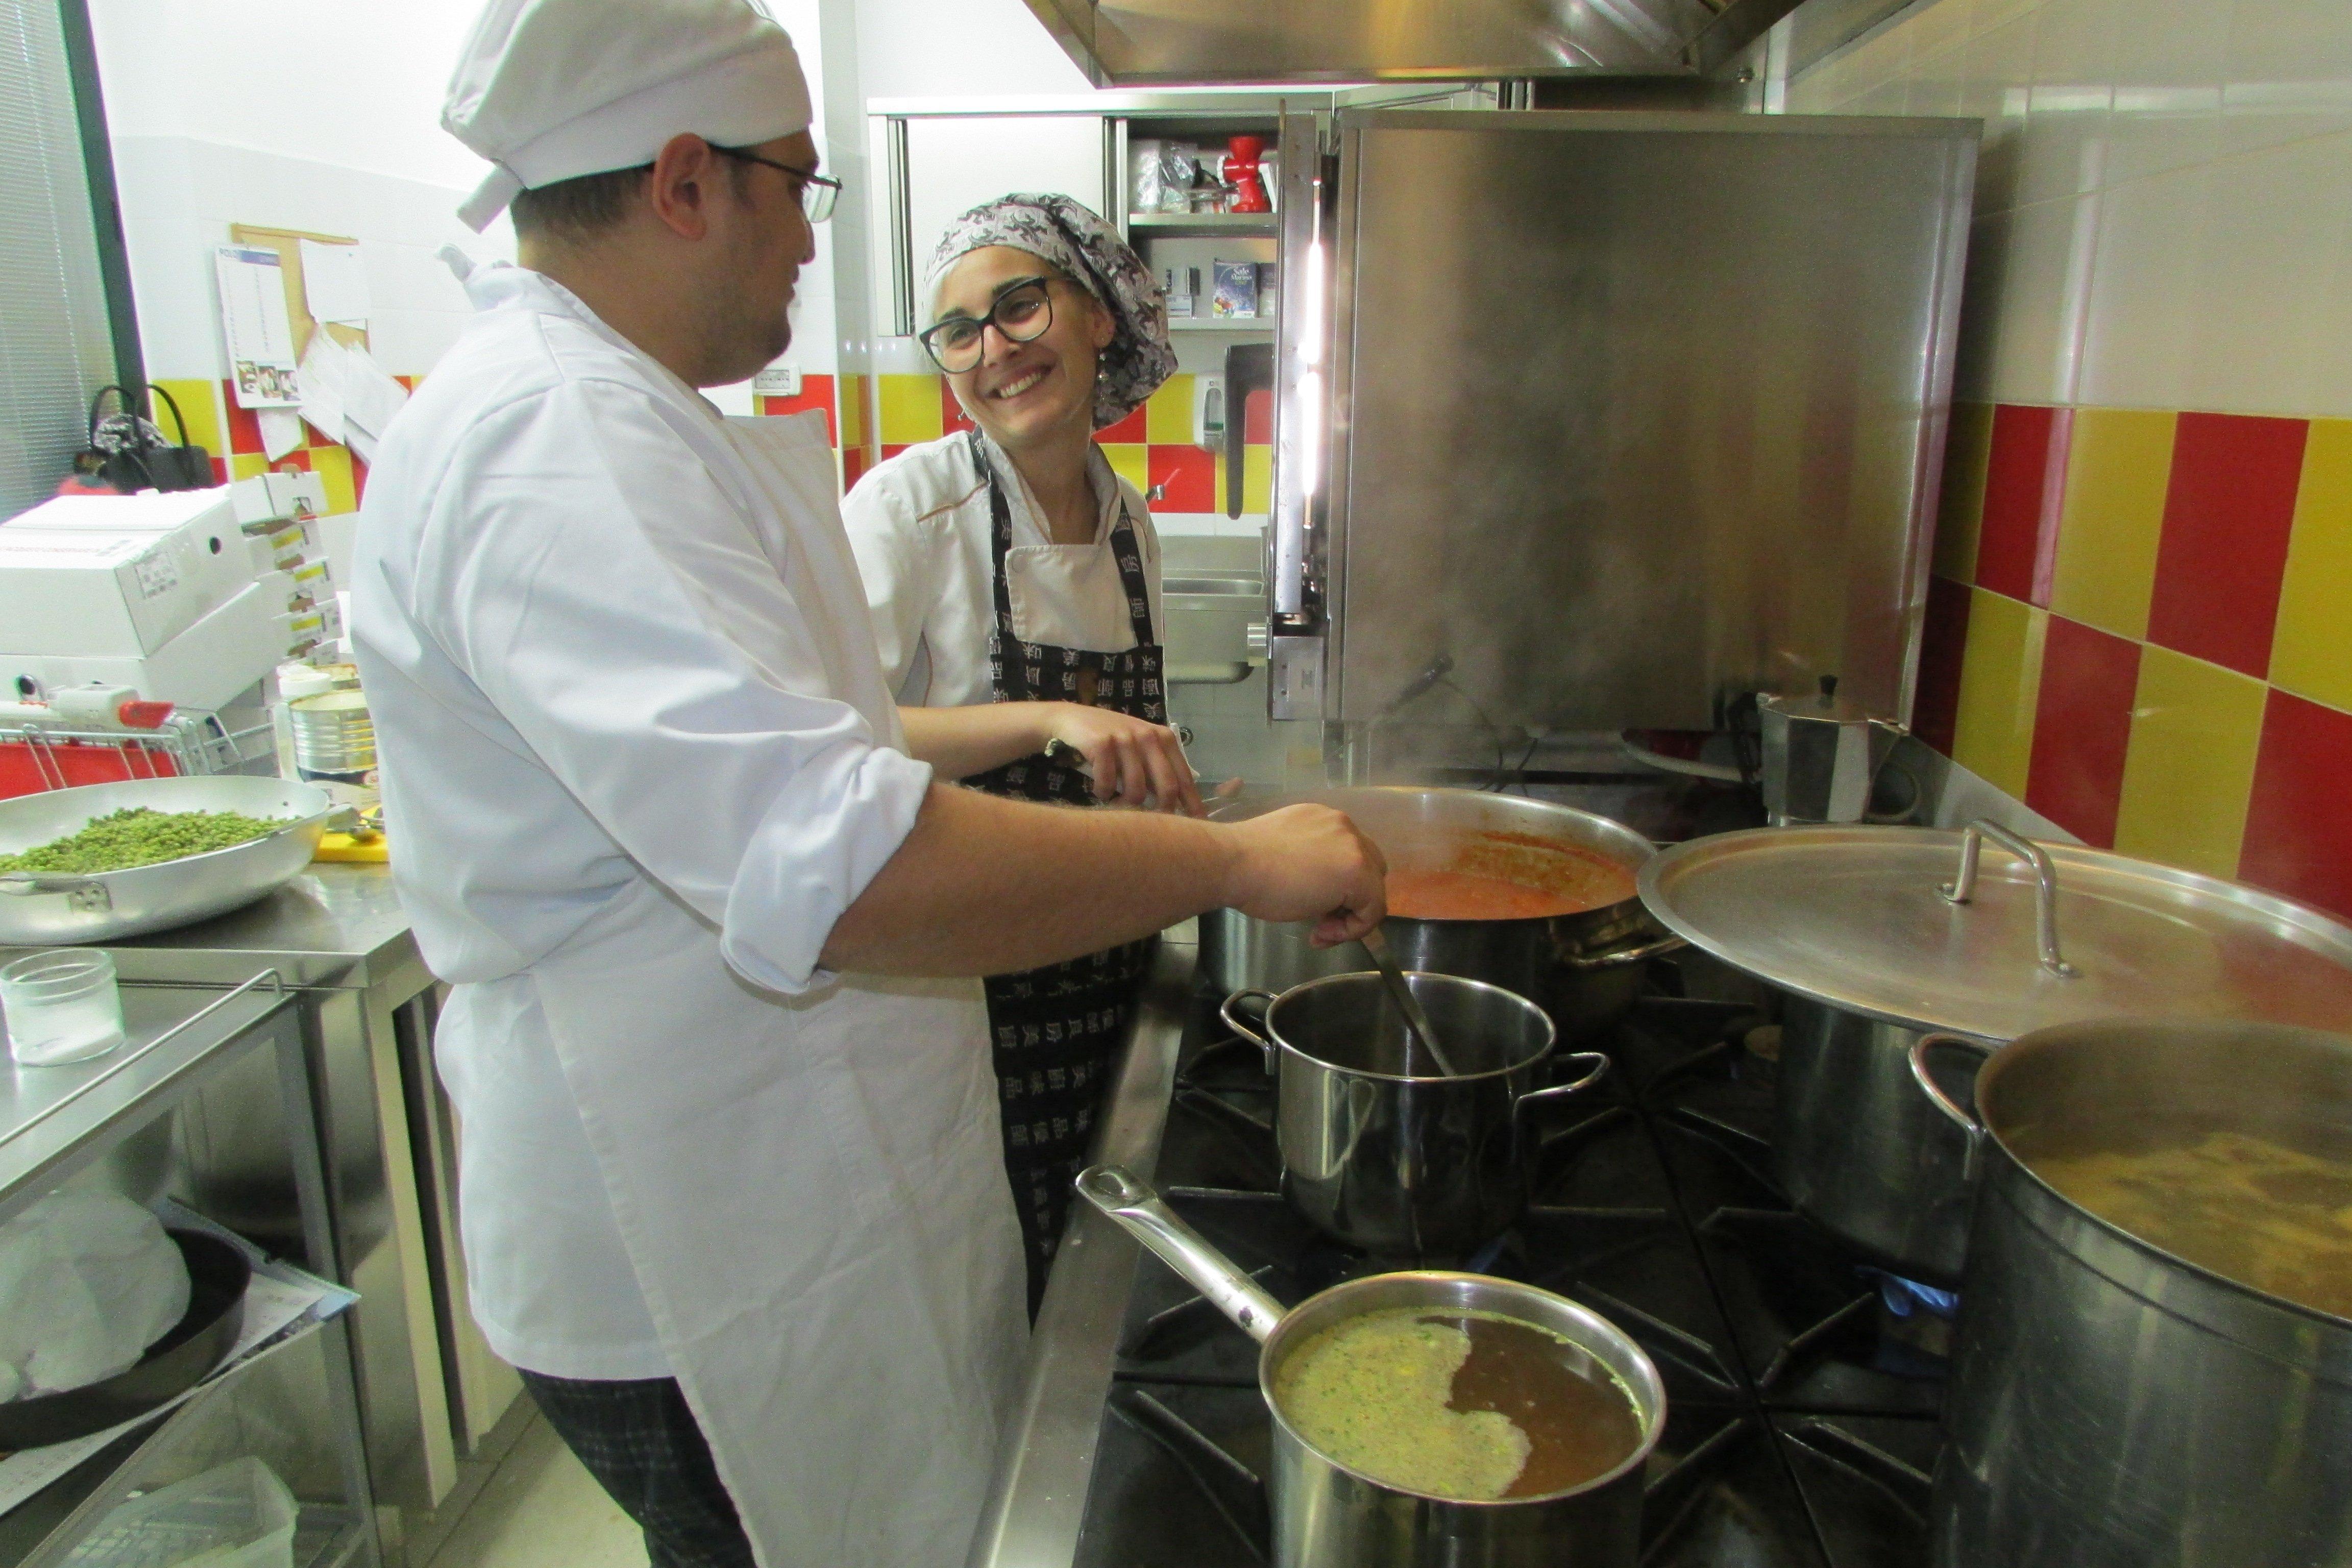 cuoco in cucina